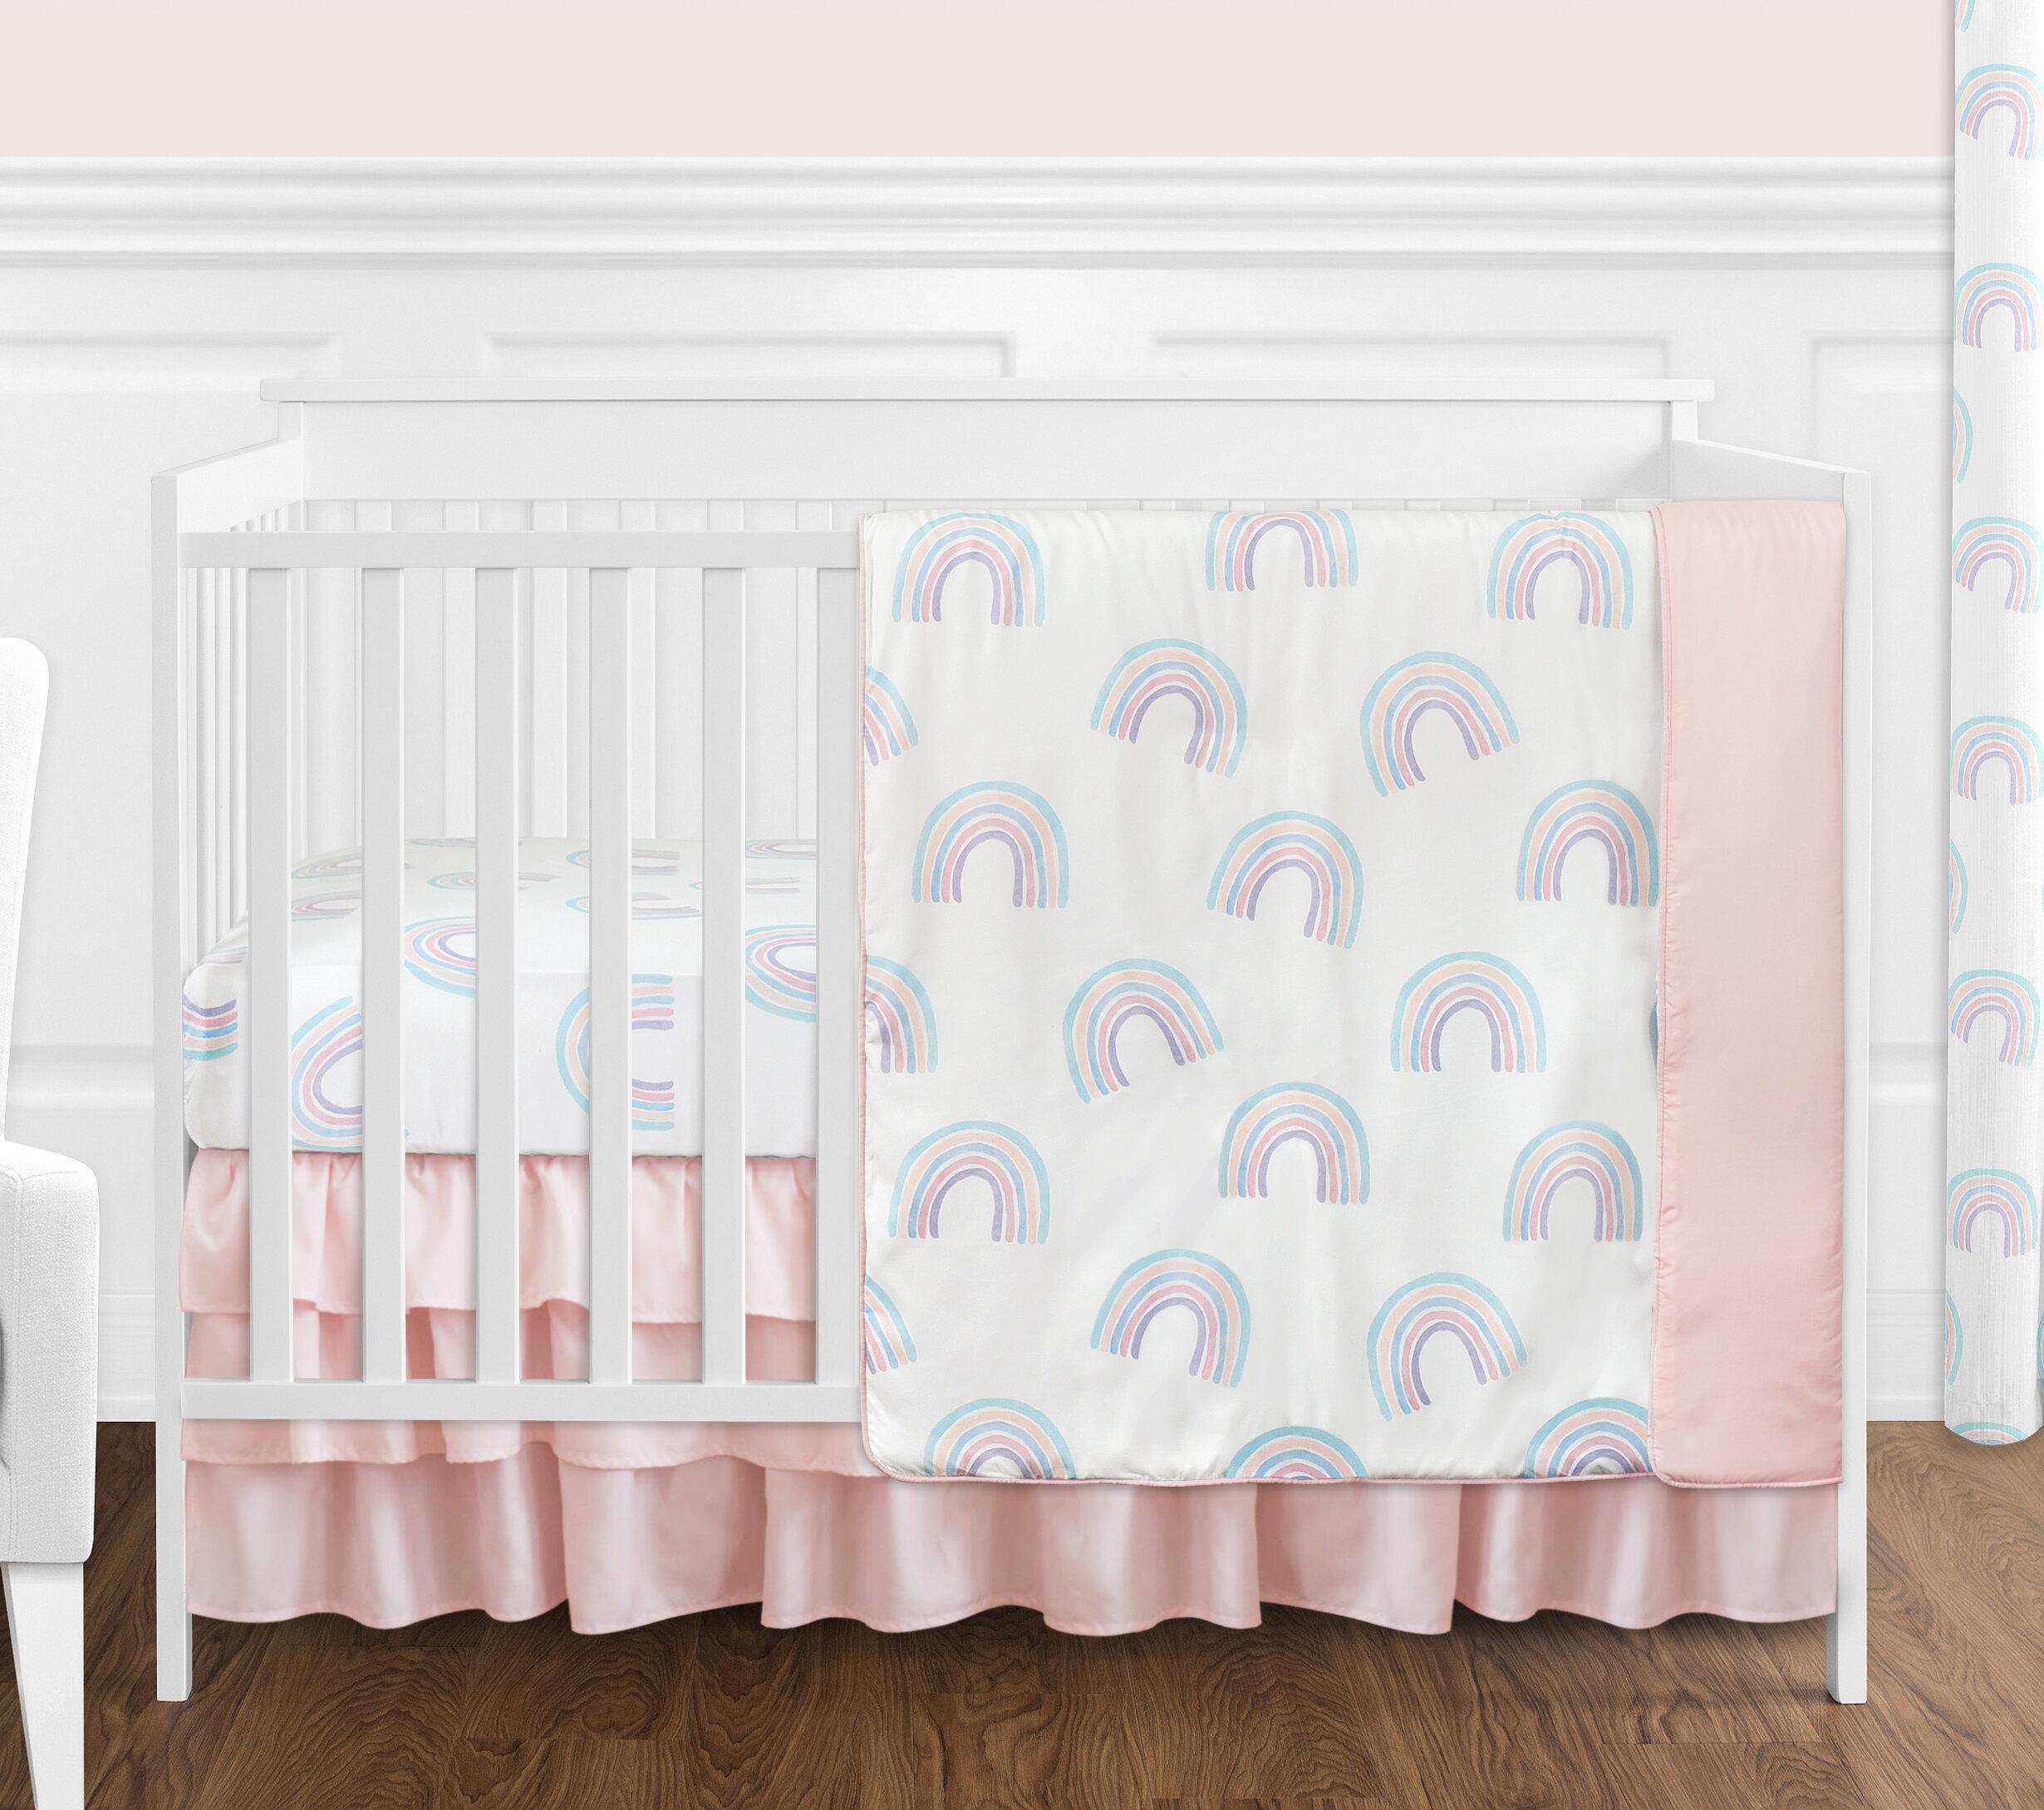 15x 35x 2 aBaby Baby Mattress